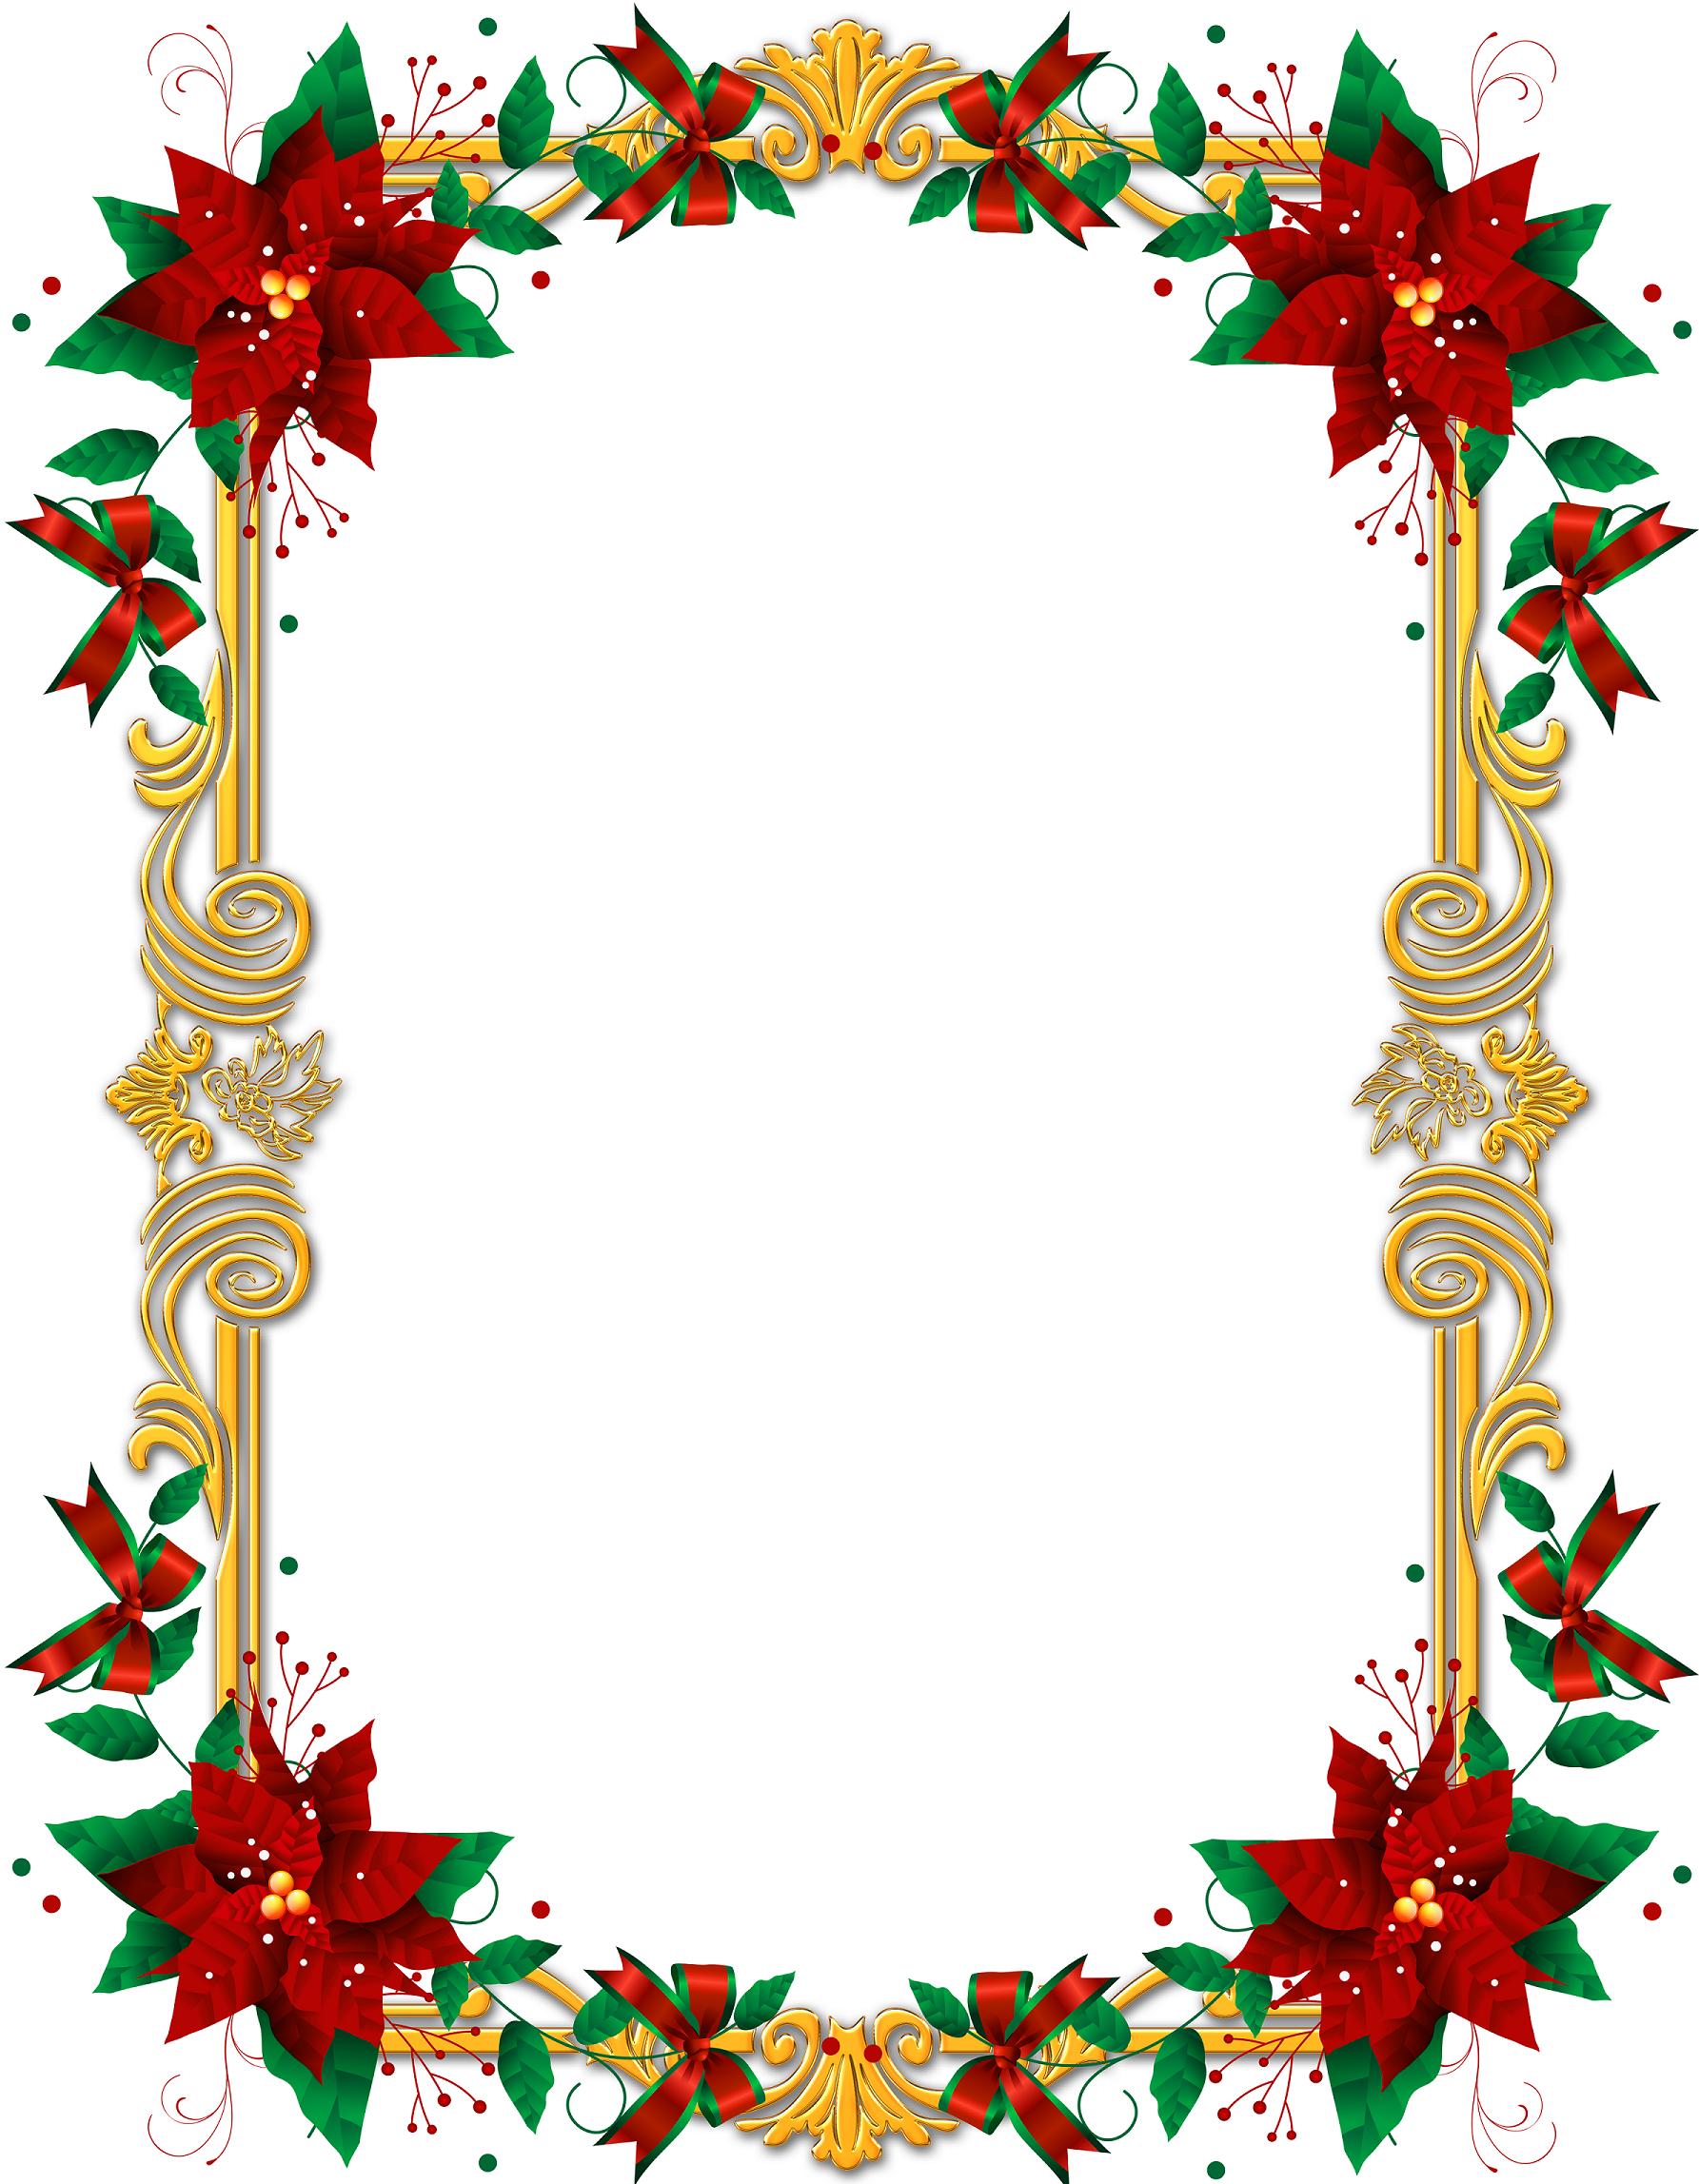 Christmas poinsettia frame christmas graphics for Poinsettia christmas tree frame